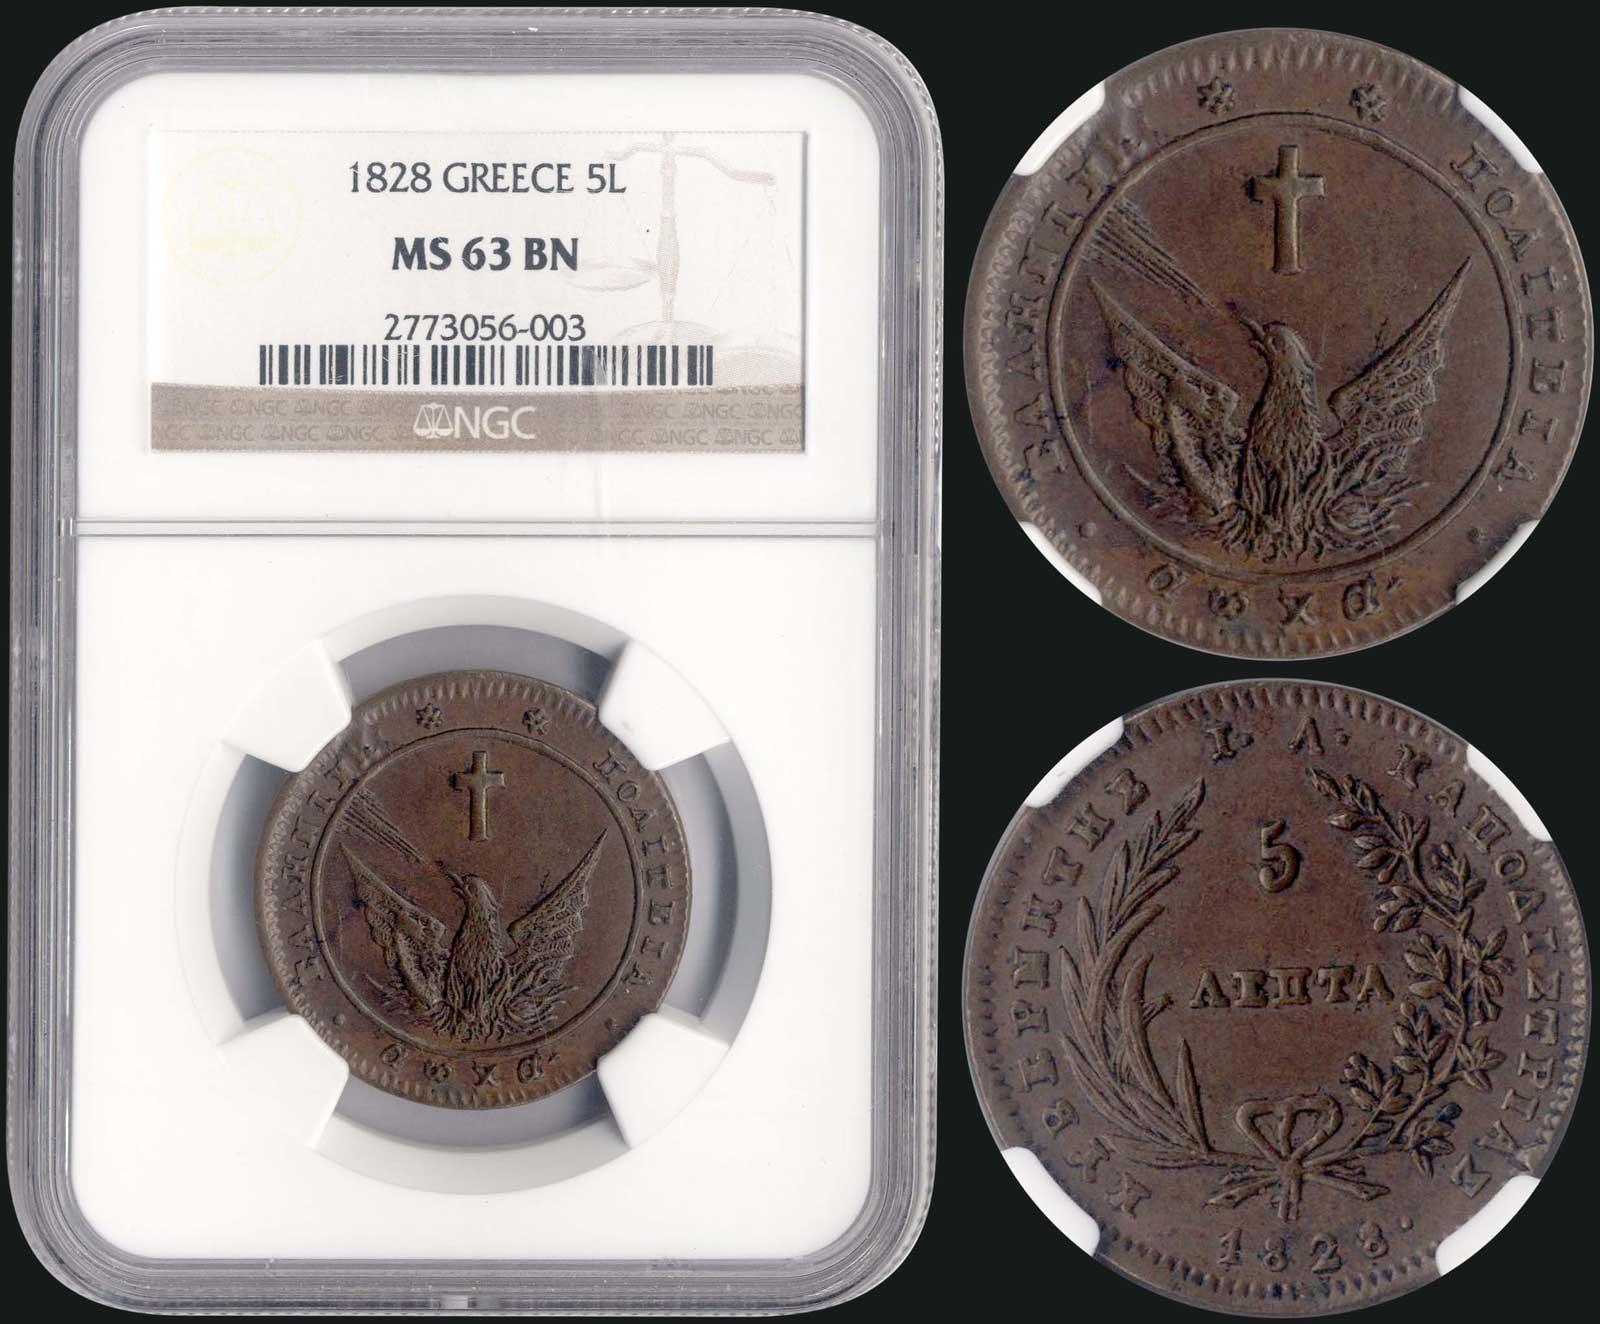 Lot 9004 - GREECE-  COINS & TOKENS governor capodistrias -  A. Karamitsos Public & LIVE Bid Auction 606 Coins, Medals & Banknotes